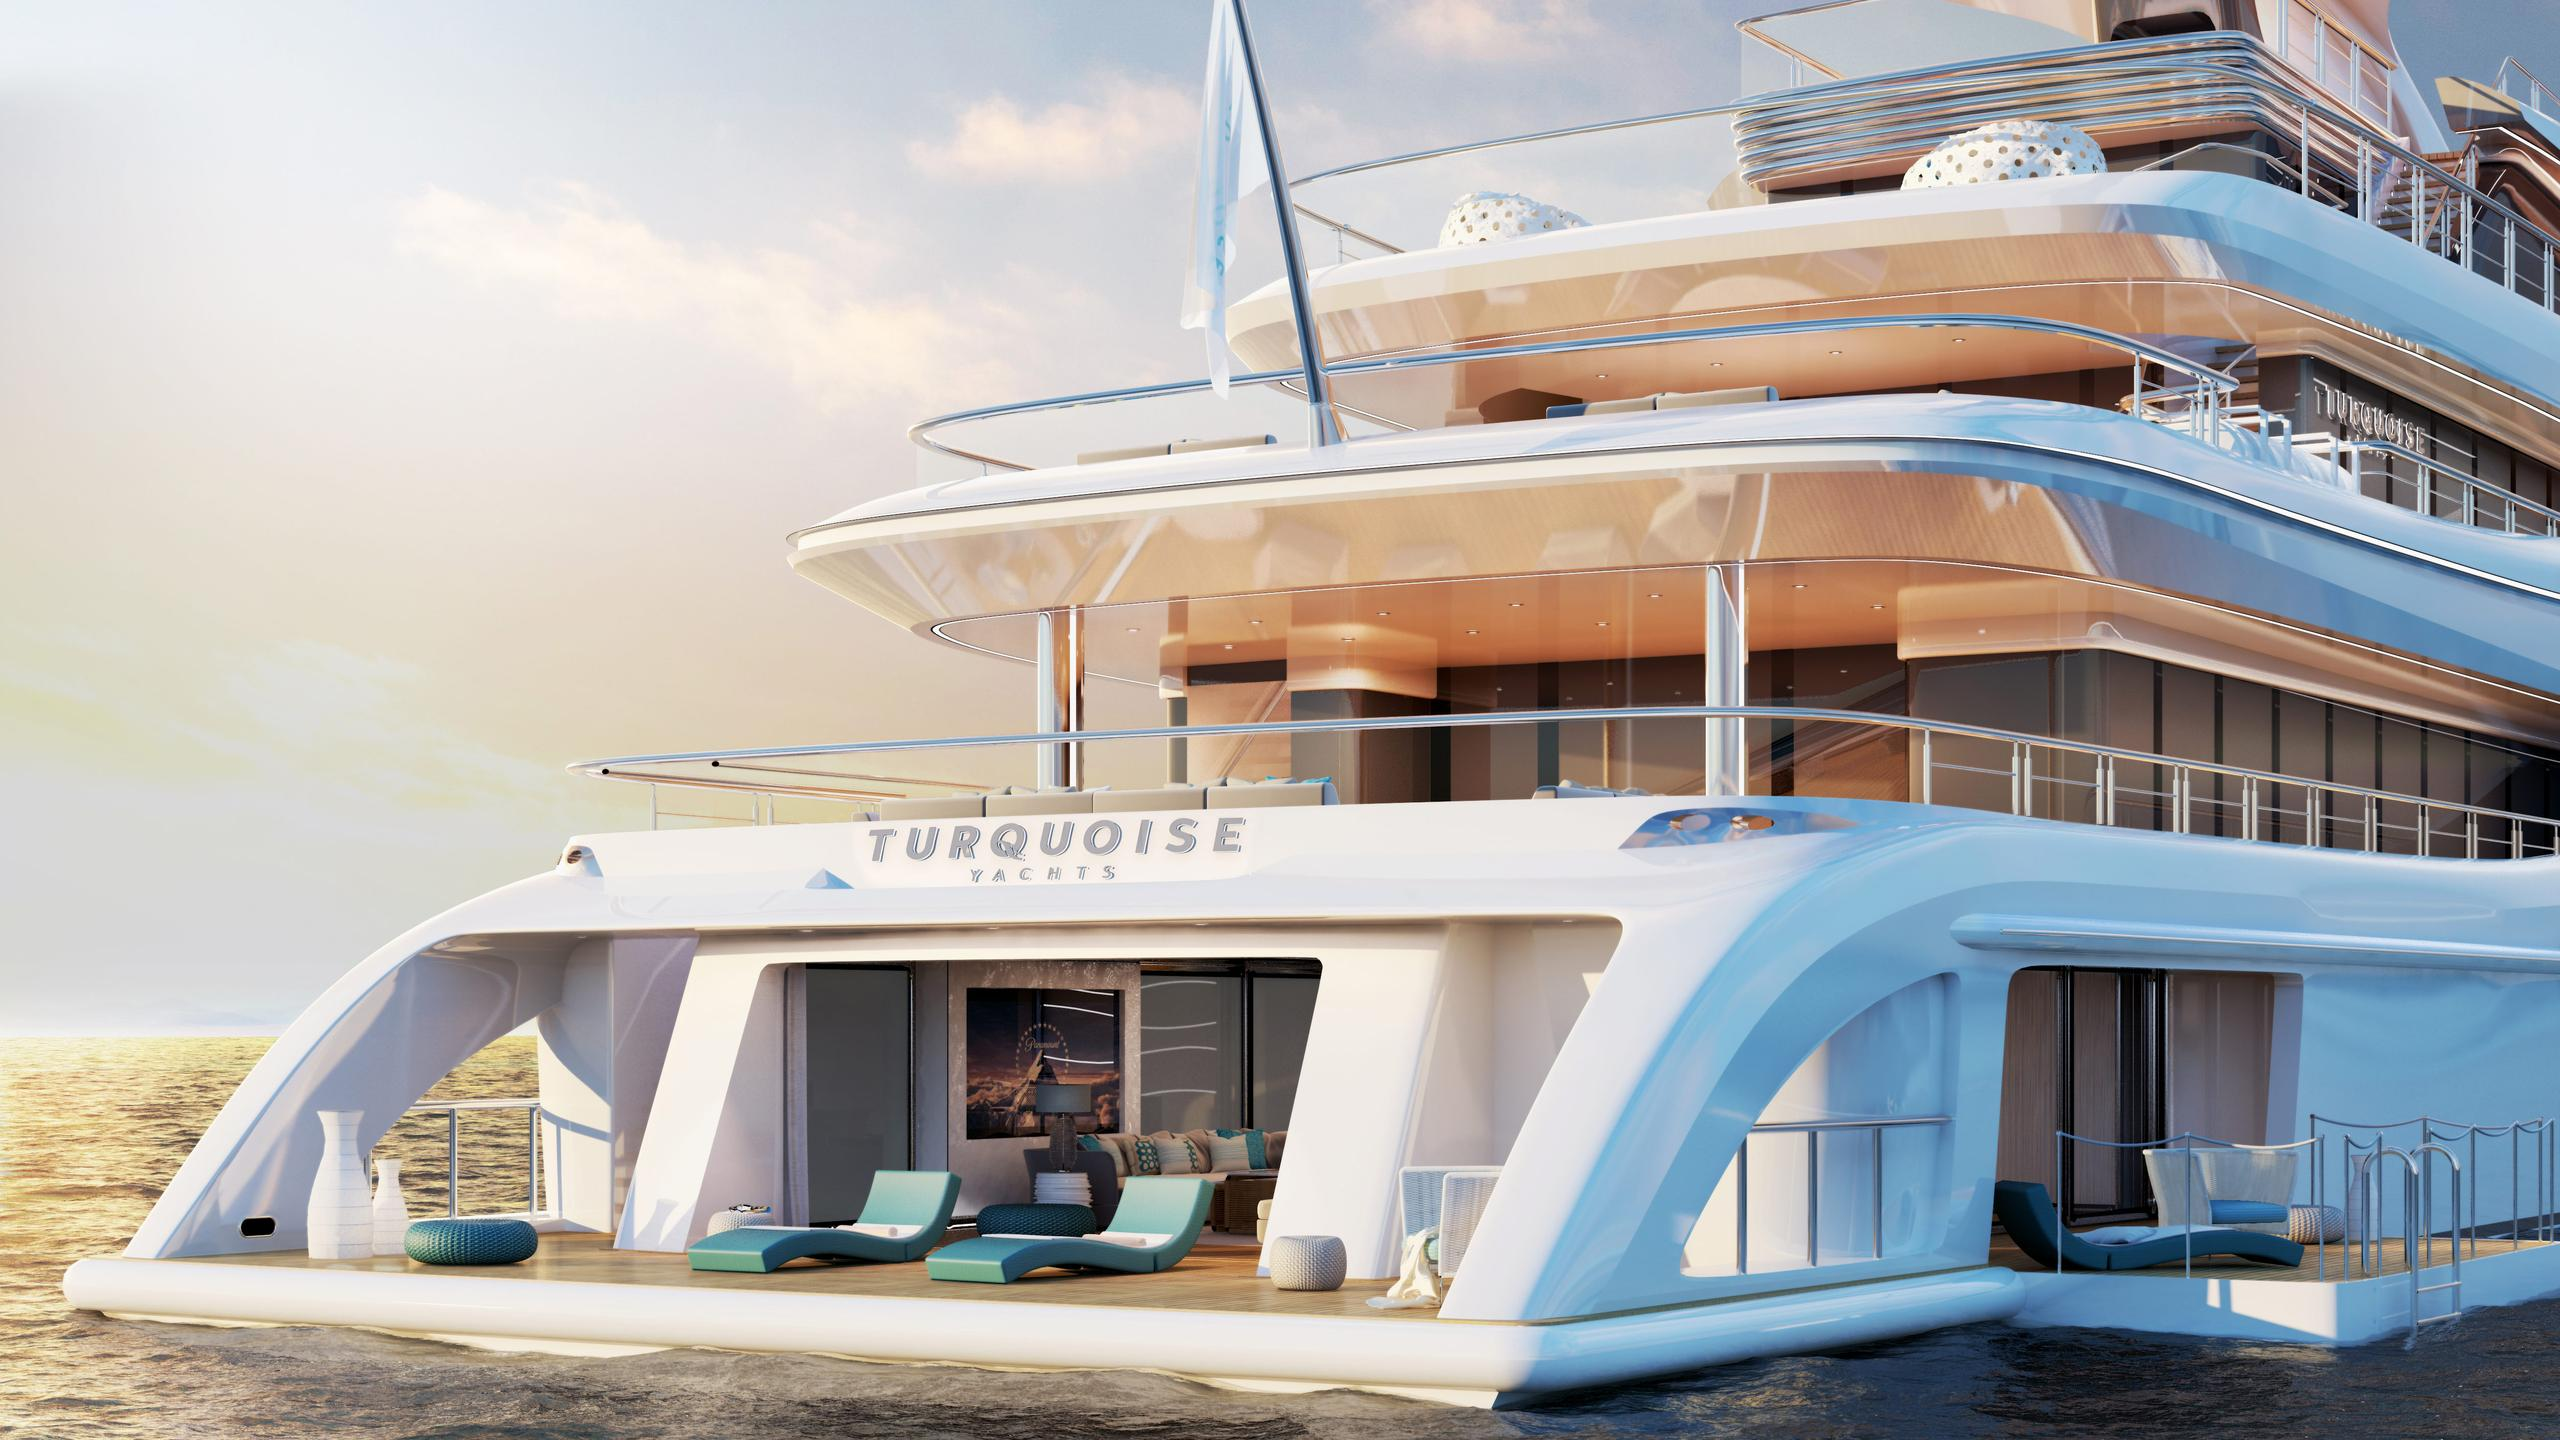 go motoryacht turquoise yachts nb63 77m 2018 rendering aft decks